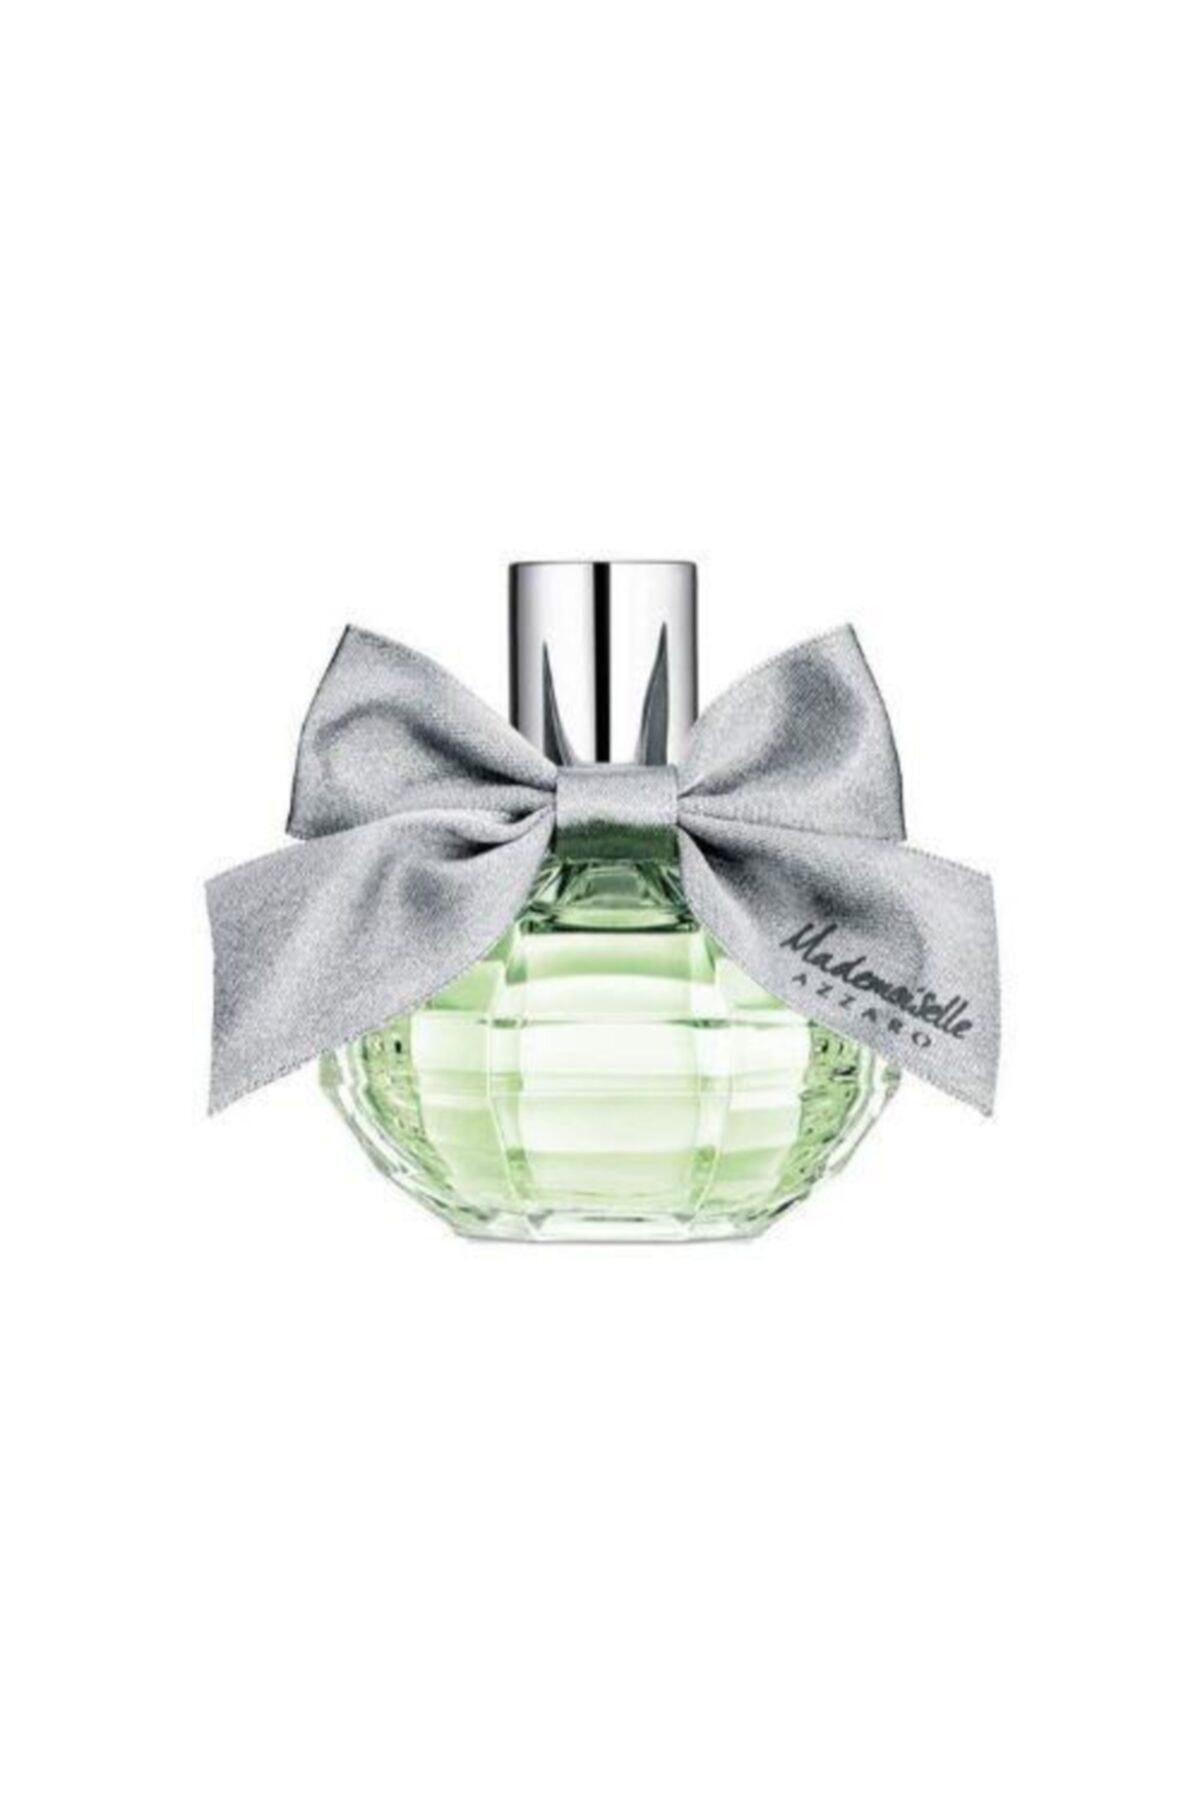 Azzaro Mademoiselle L'eau Edt 50 ml Kadın Parfüm 3351500009190 1